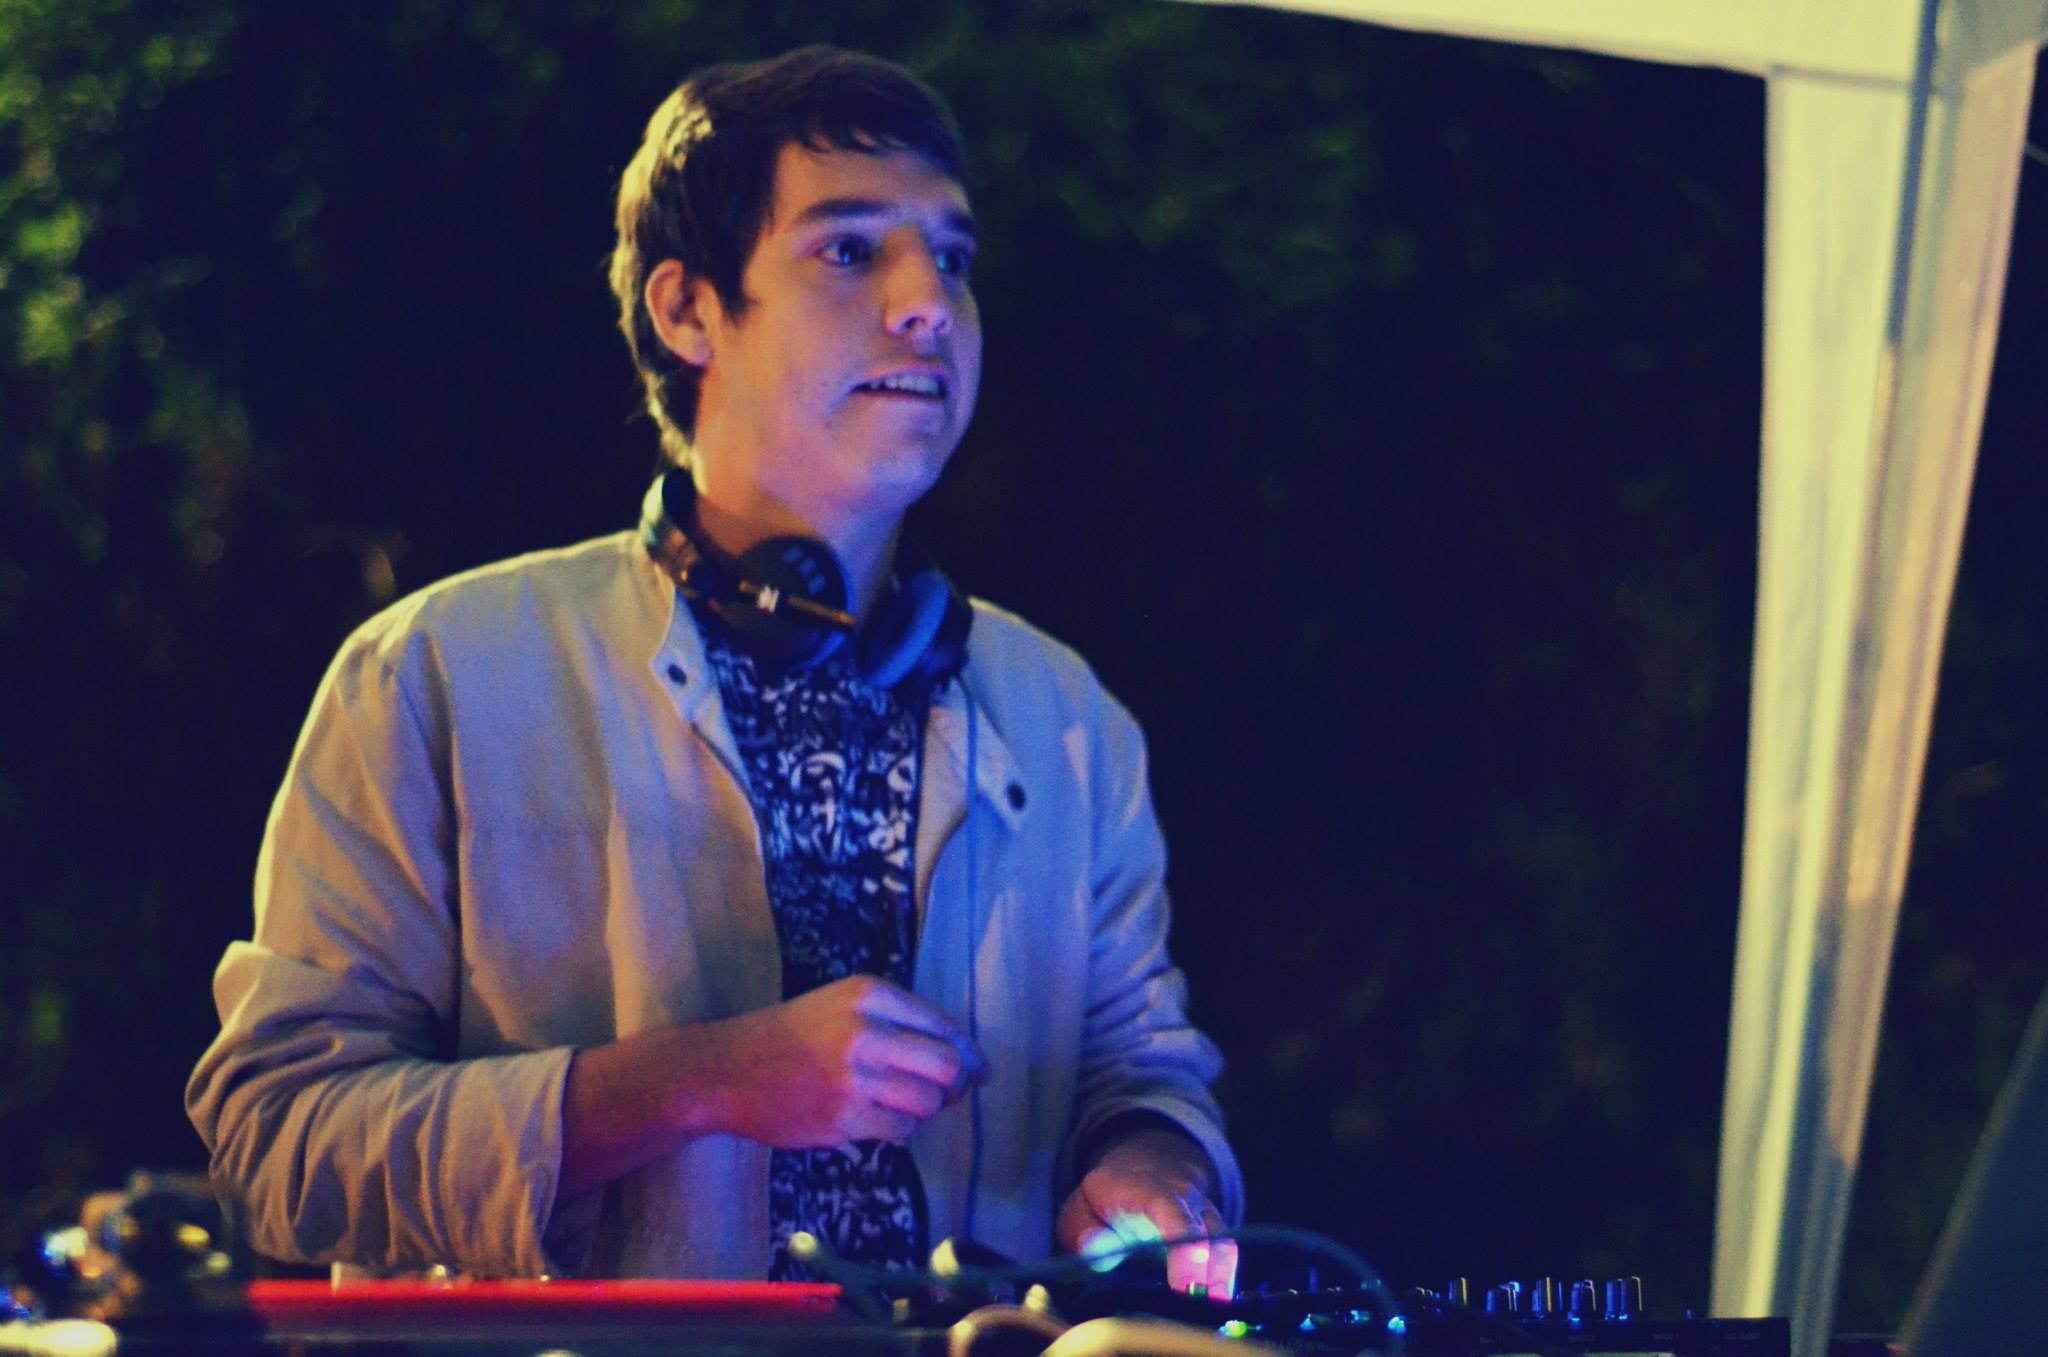 Mp3: Jorge Jara aka RAJ - Obscura Mixtape - Serie 2